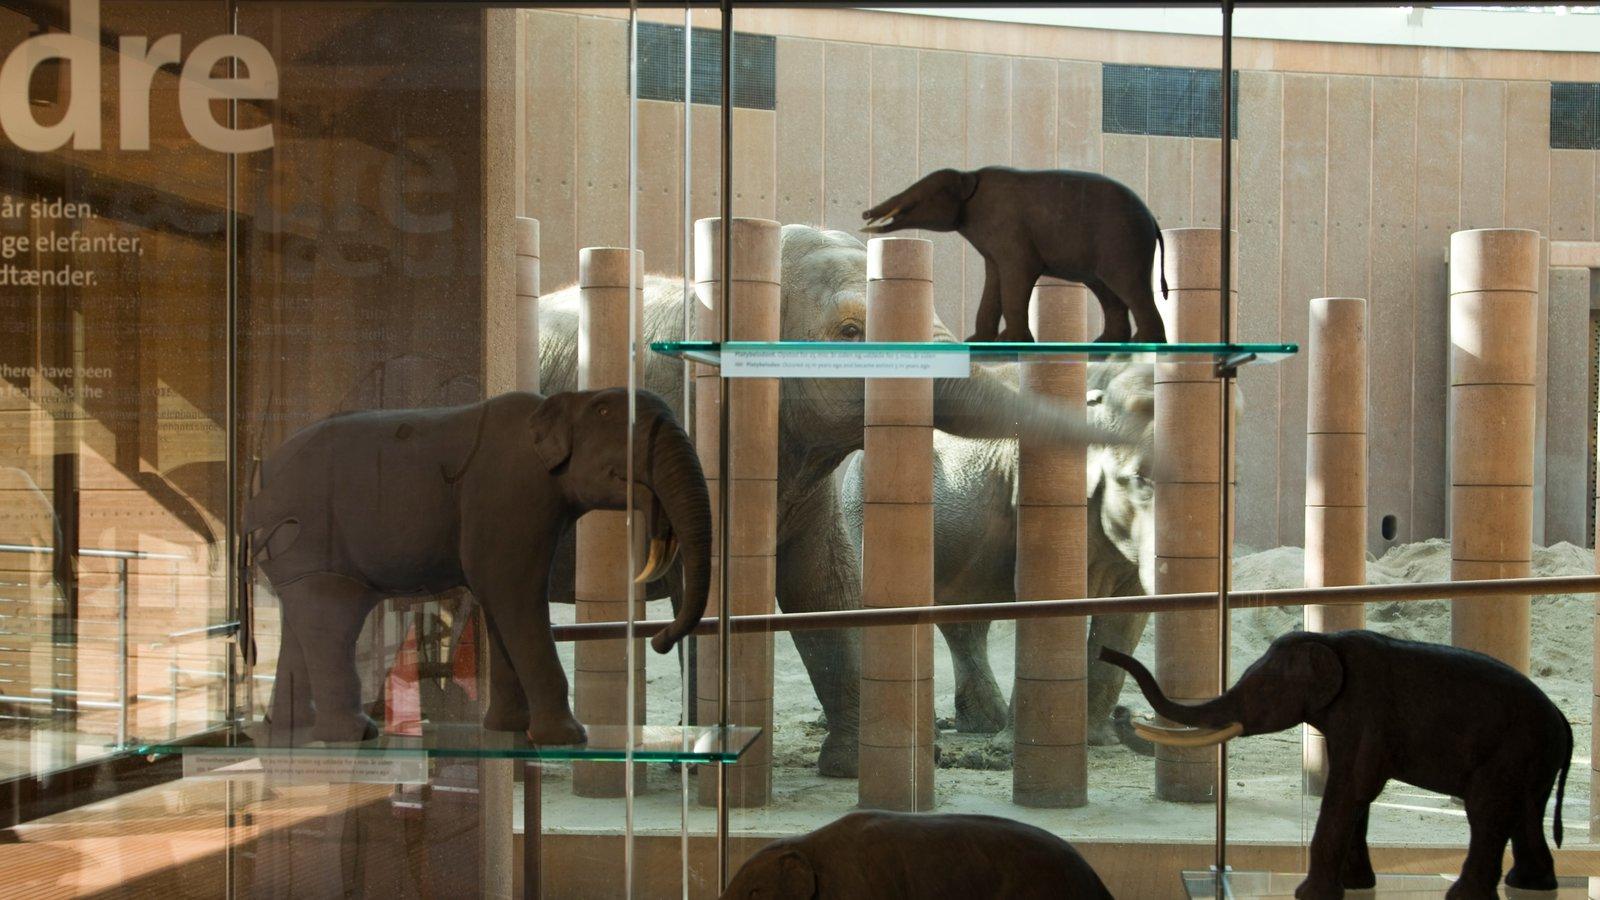 Copenhagen Zoo which includes land animals, zoo animals and interior views